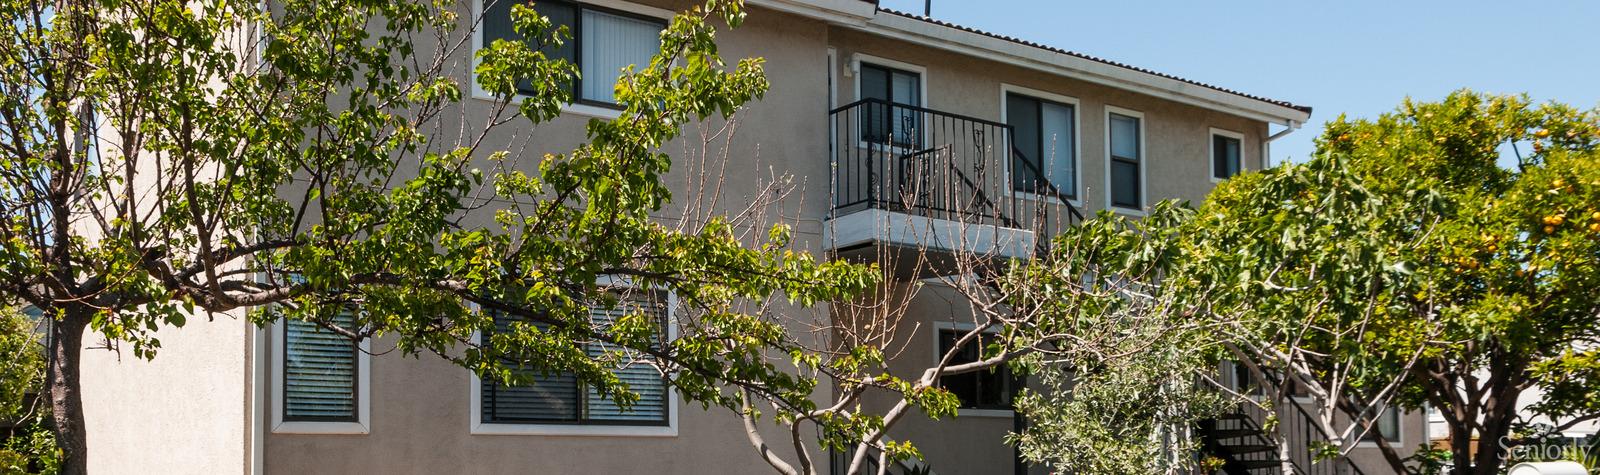 B&B Residential Facilities (3824) San Mateo CA 4